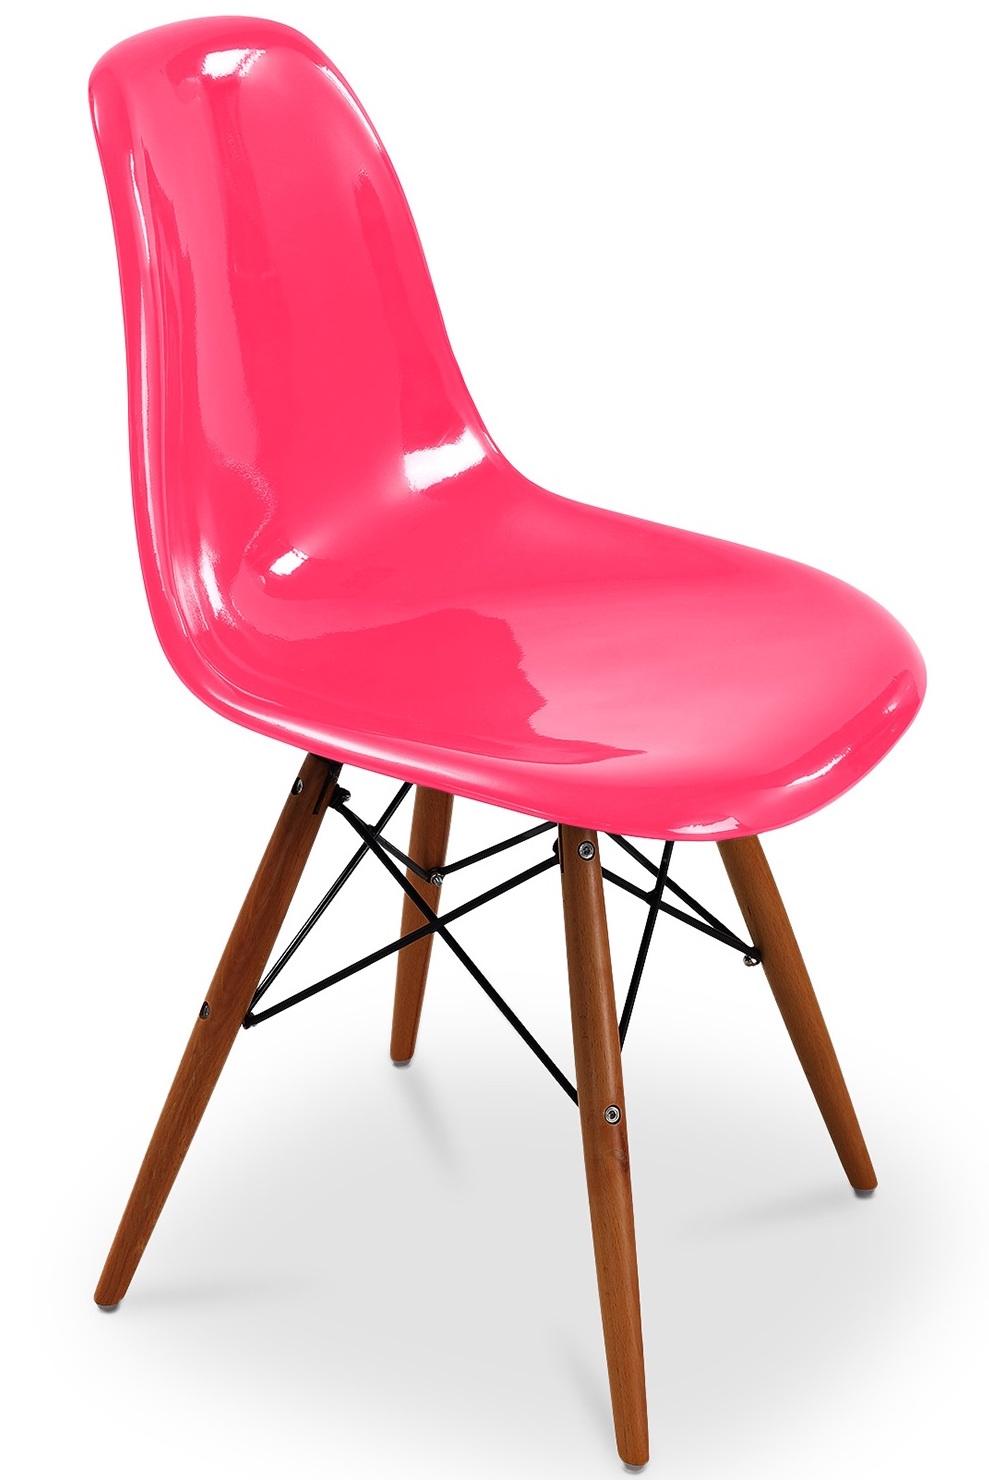 chaise en fibre de verre fuchsia brillant inspir 233 e dsw lestendances fr